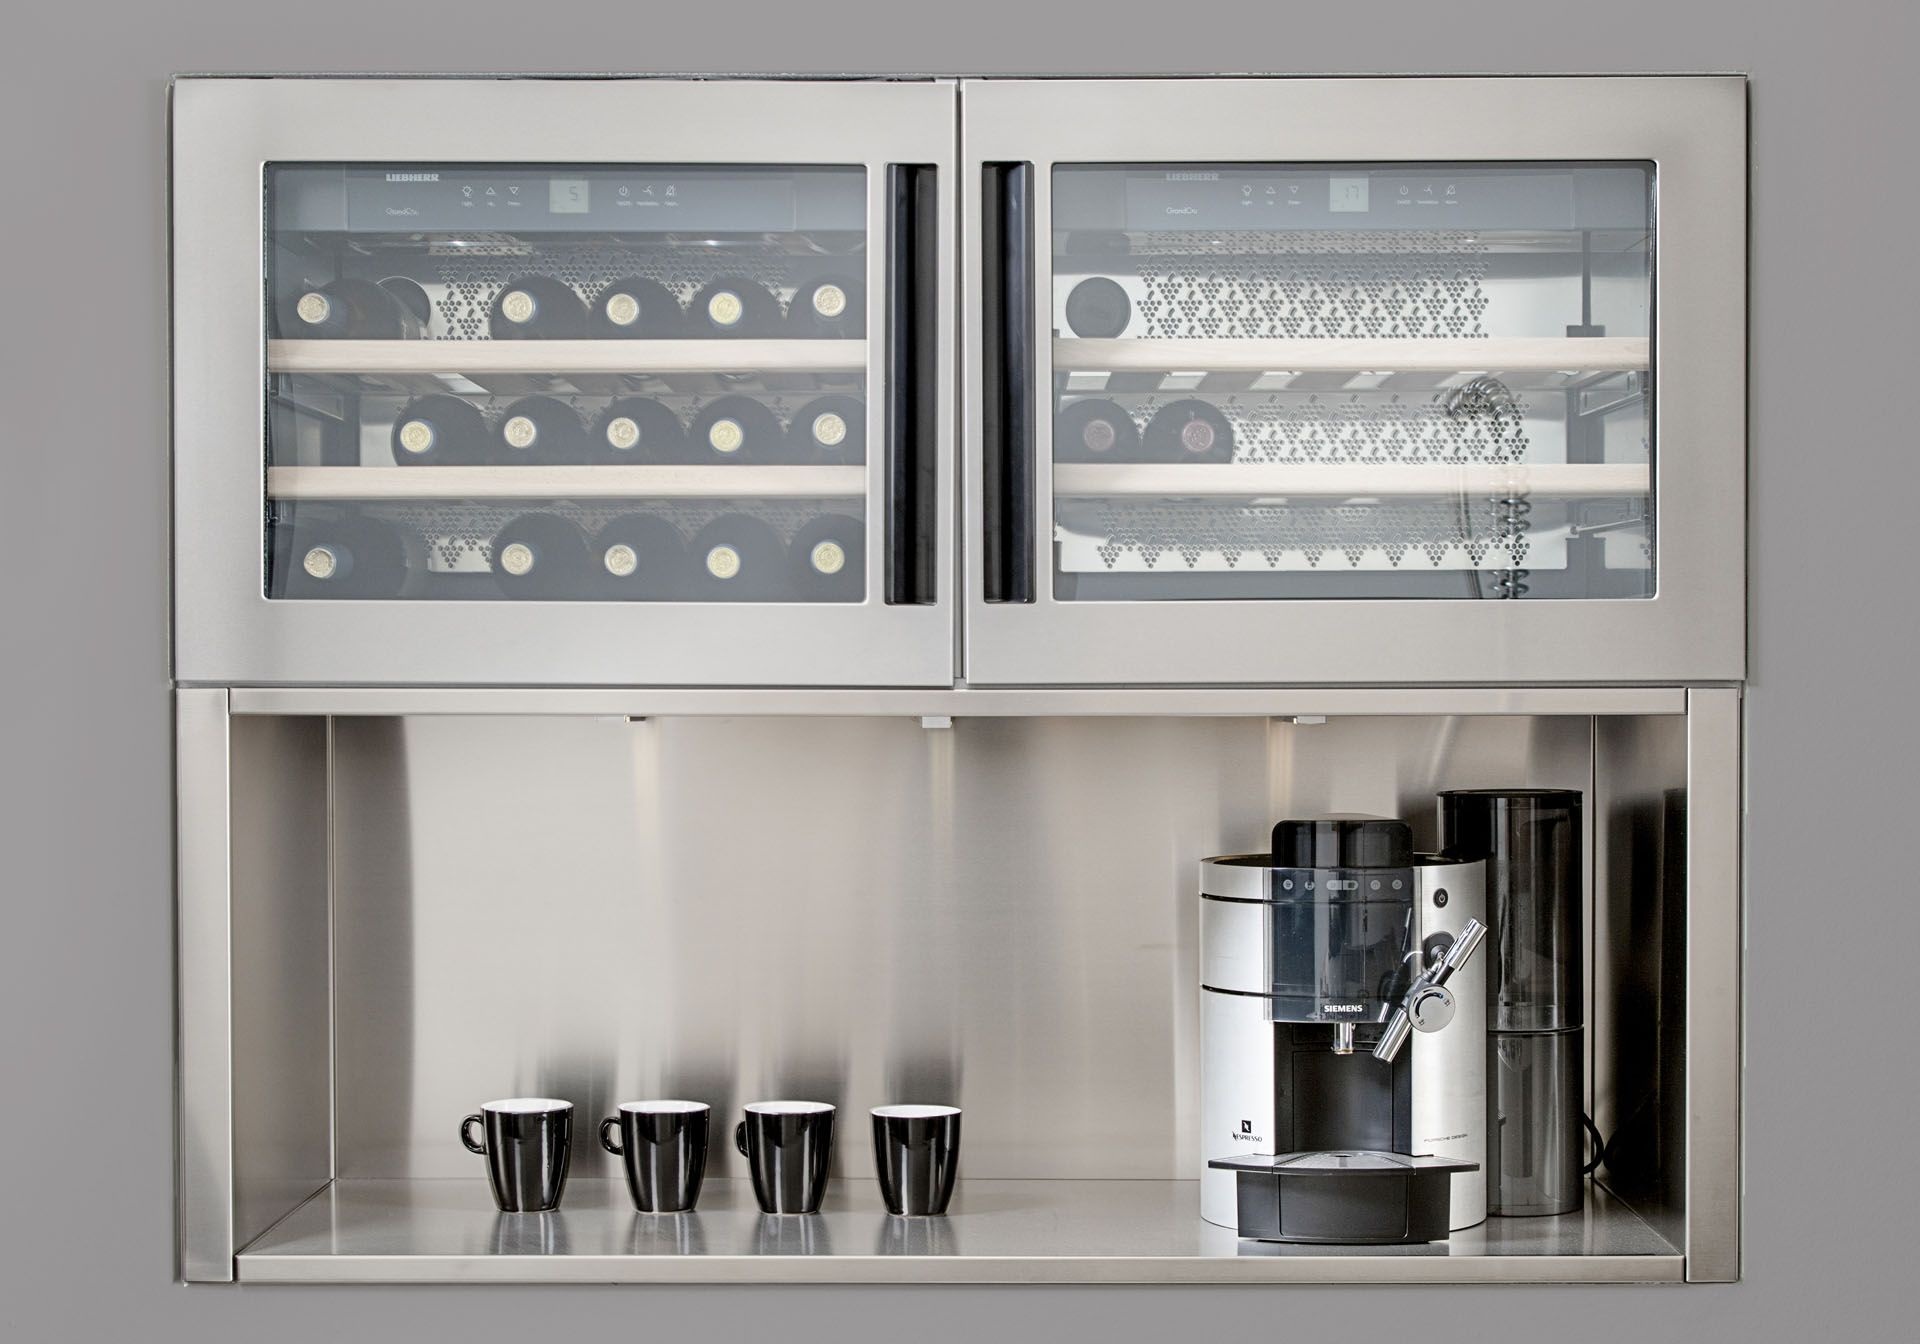 liebherr wijnklimaatkast wijnkoelkast pinterest einfamilienhaus. Black Bedroom Furniture Sets. Home Design Ideas